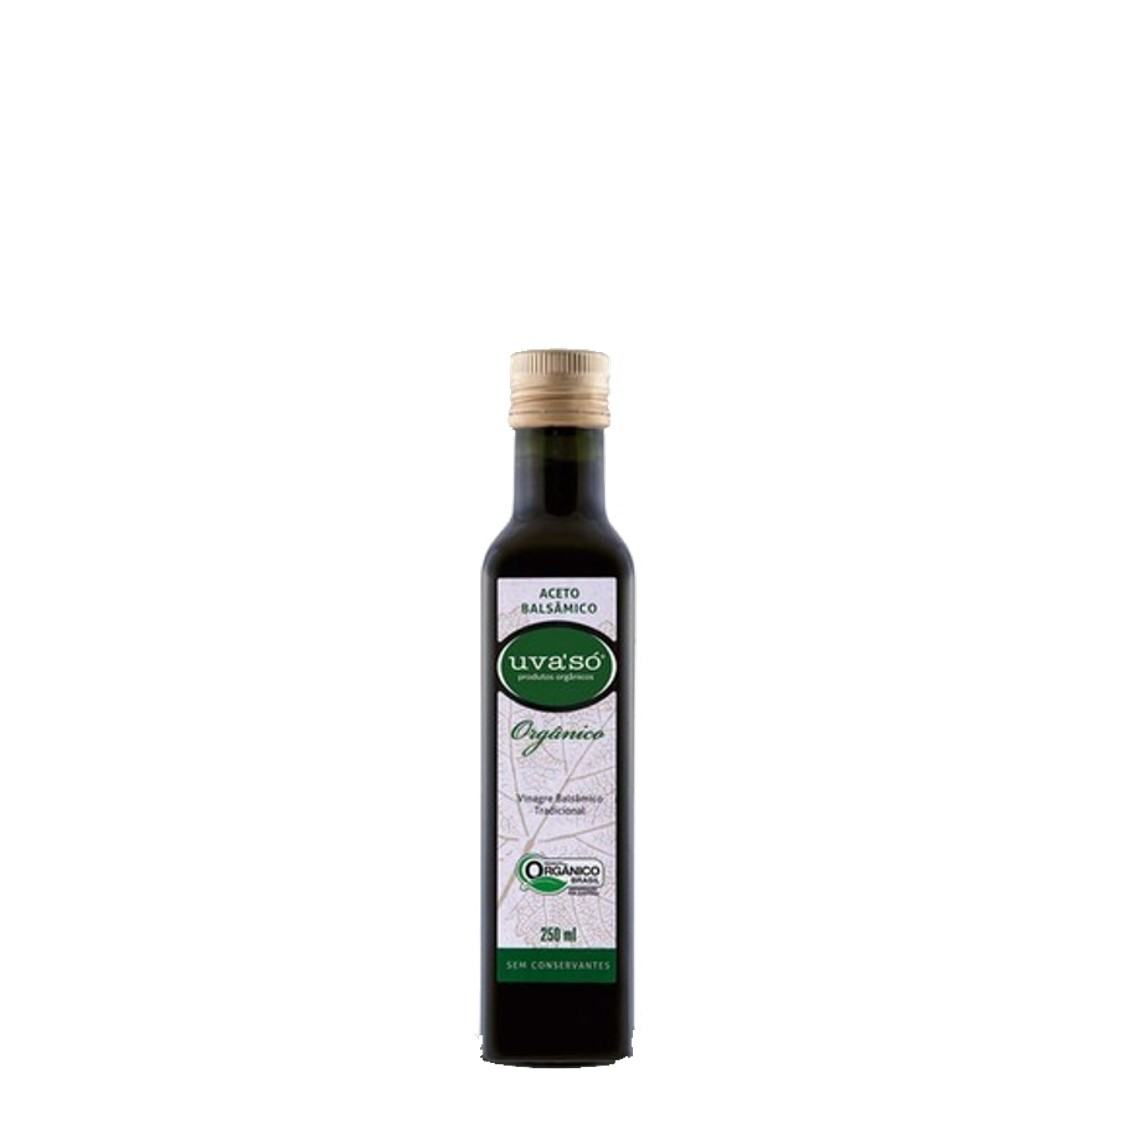 Vinagre Balsâmico (250ml) – Uva'só